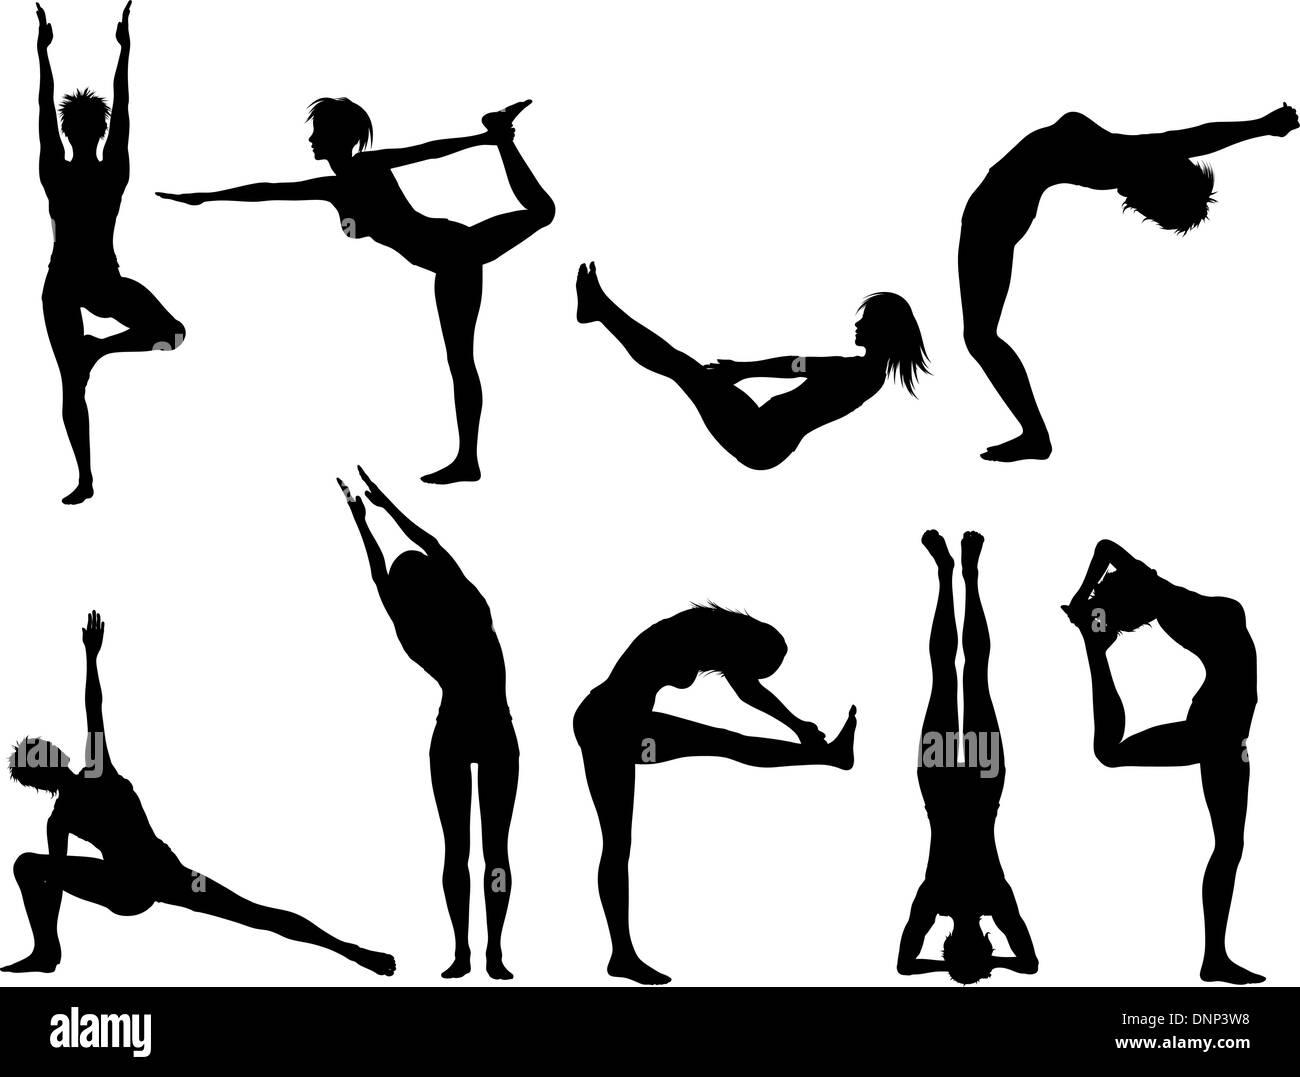 Sagome di femmine in vari yoga pone Immagini Stock